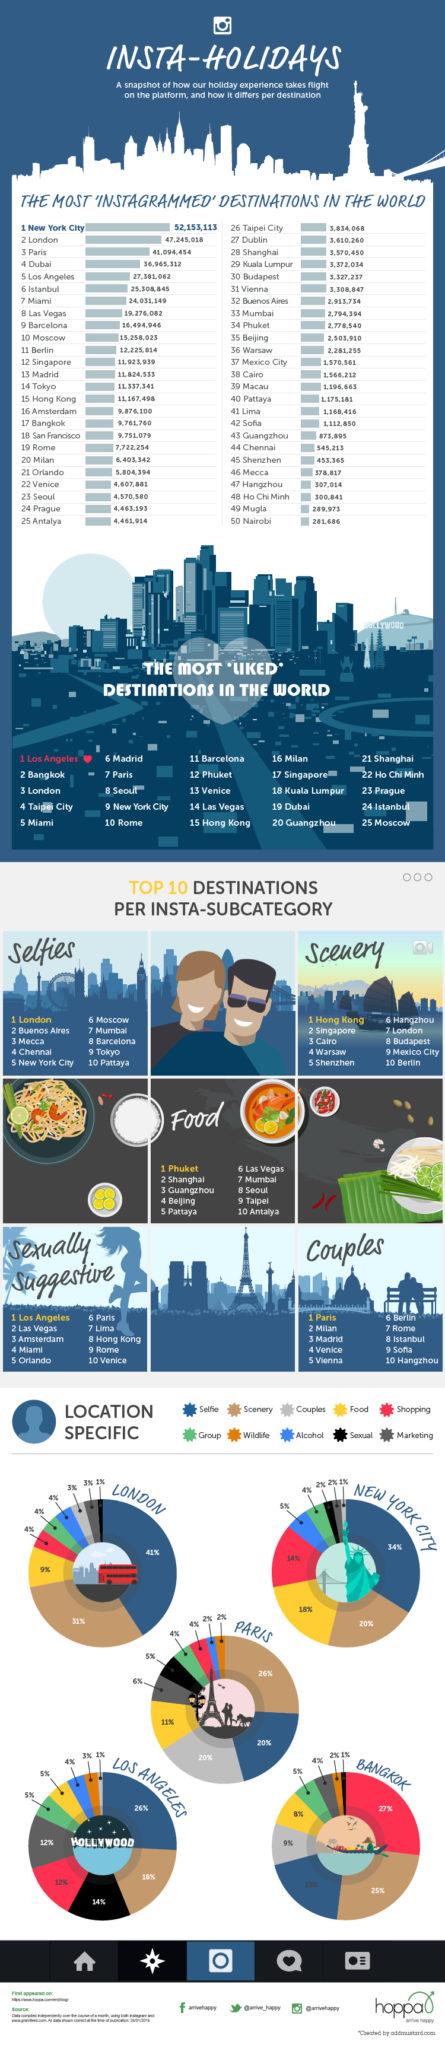 hoppa_INSTA-breakdown_Infographic2-01-01